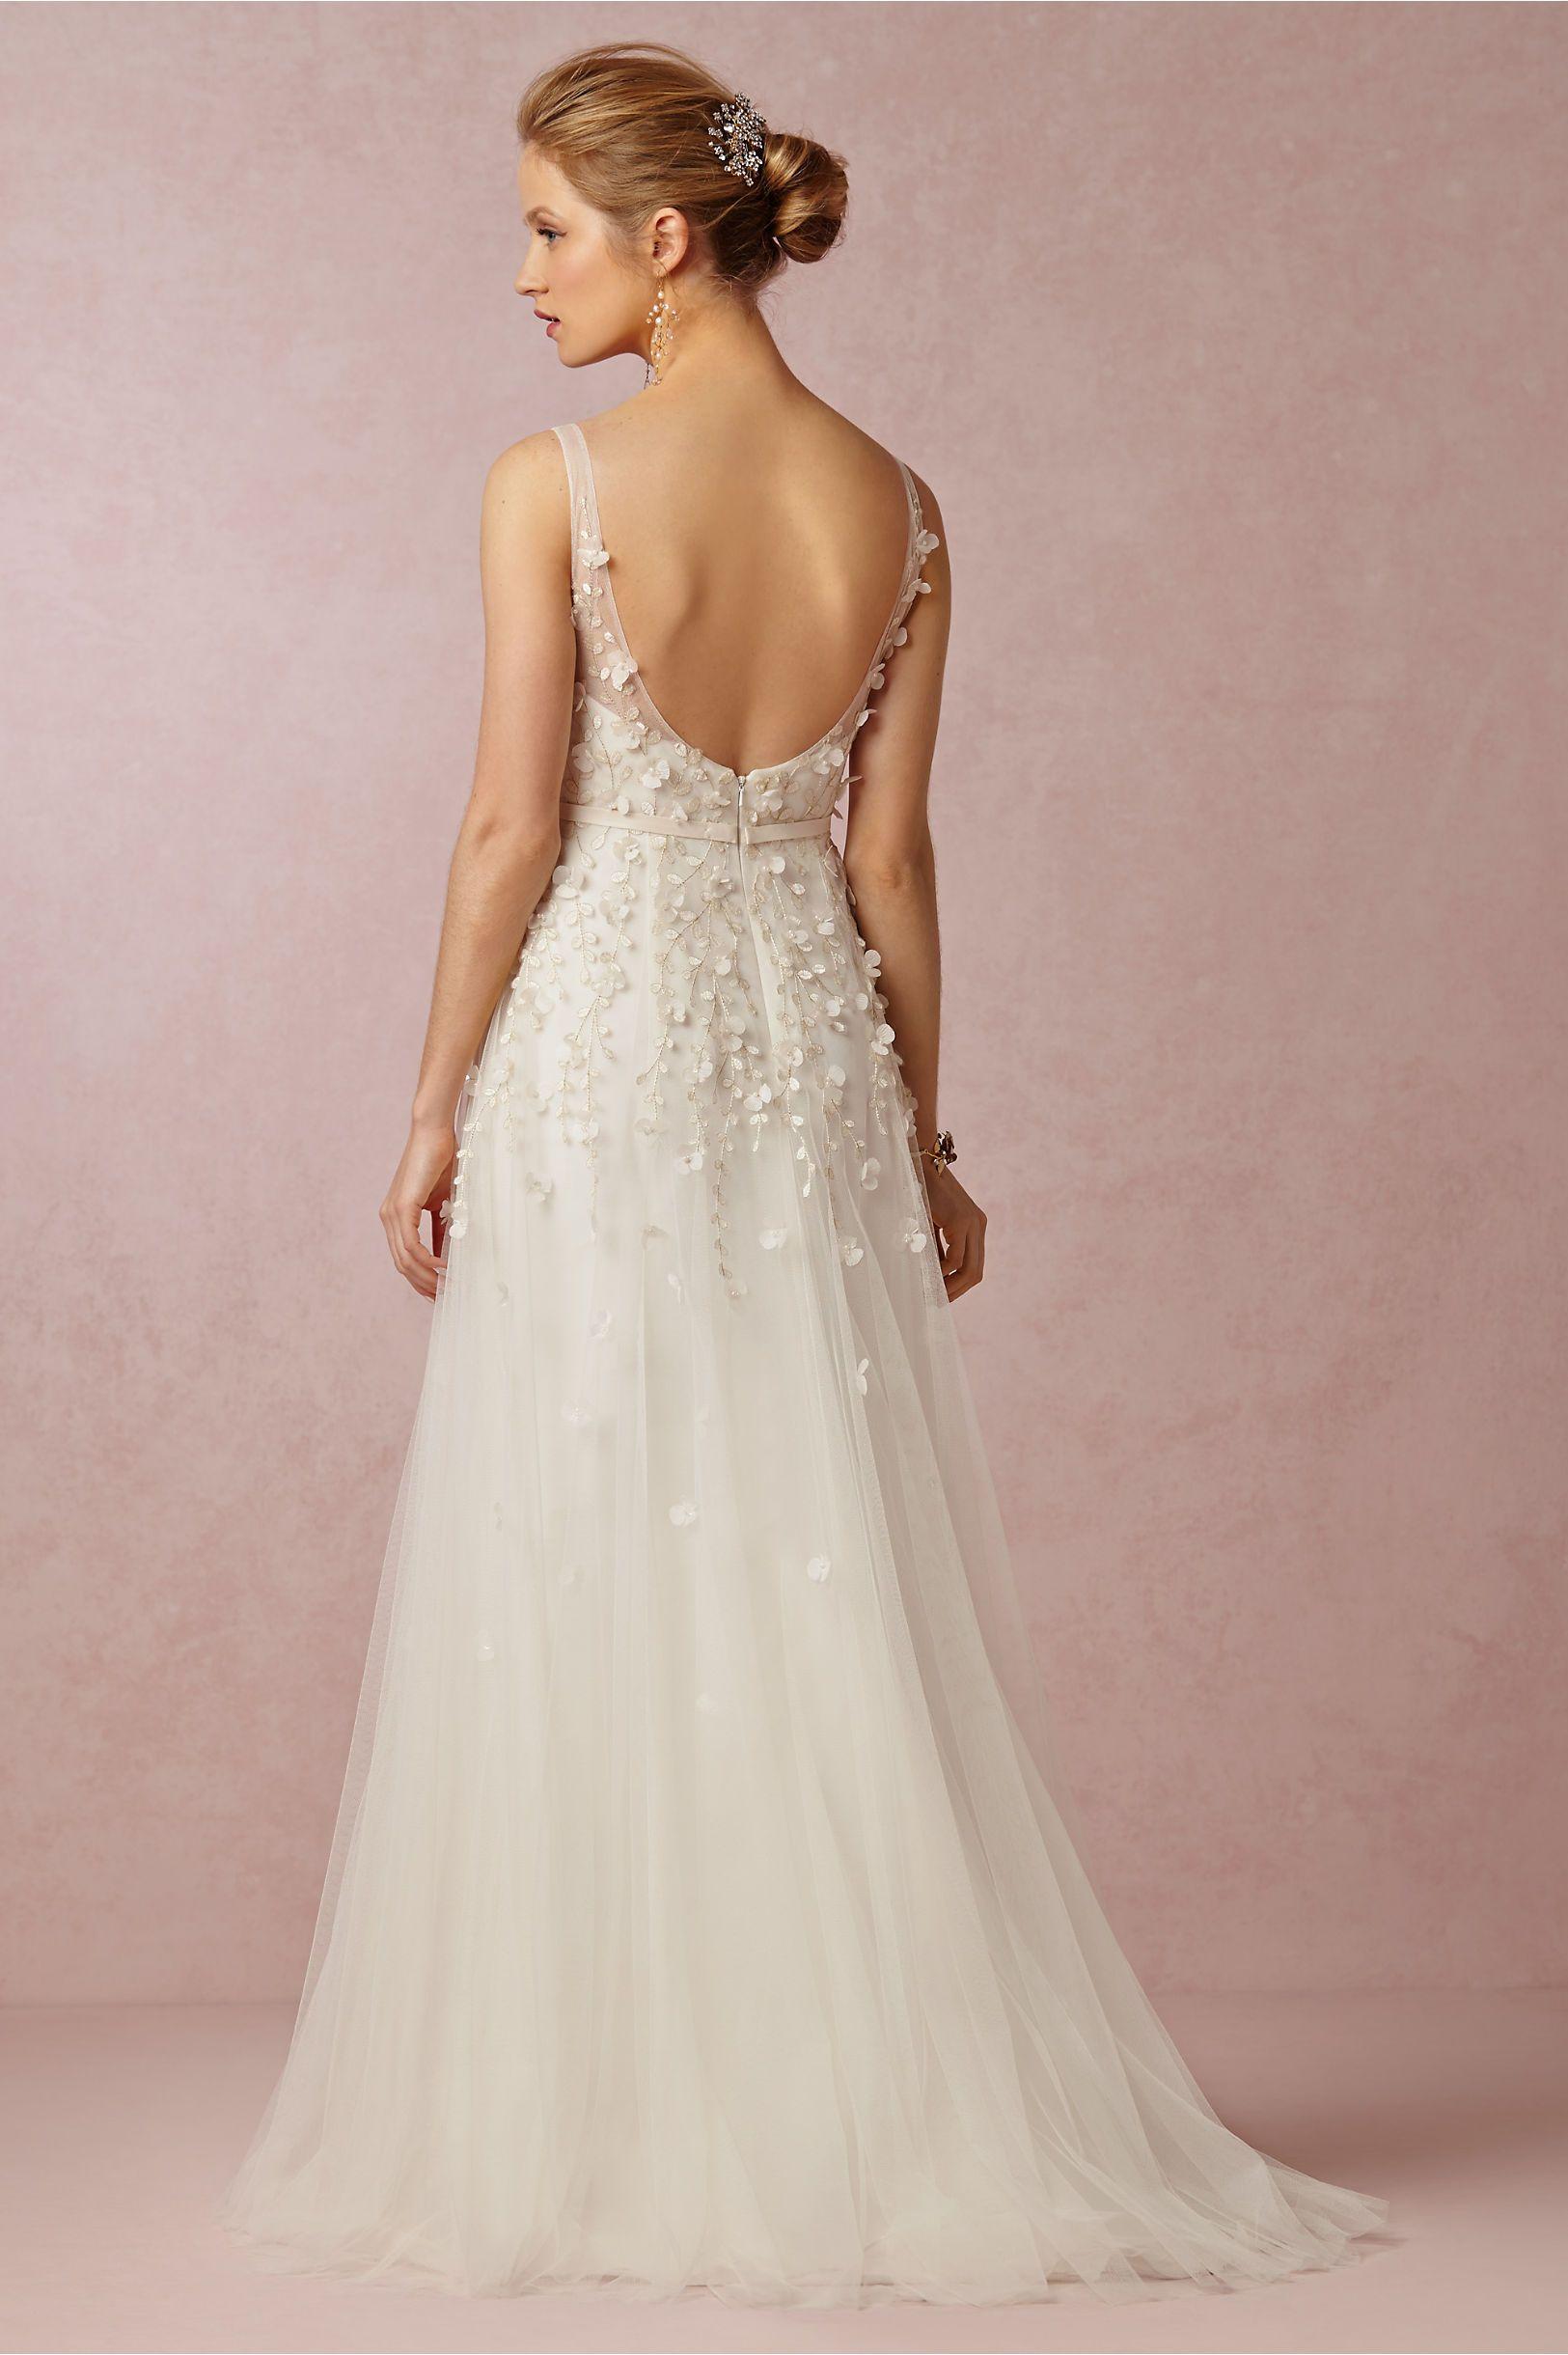 Luisa Gown In Bride Wedding Dresses At Bhldn Wedding Dresses In